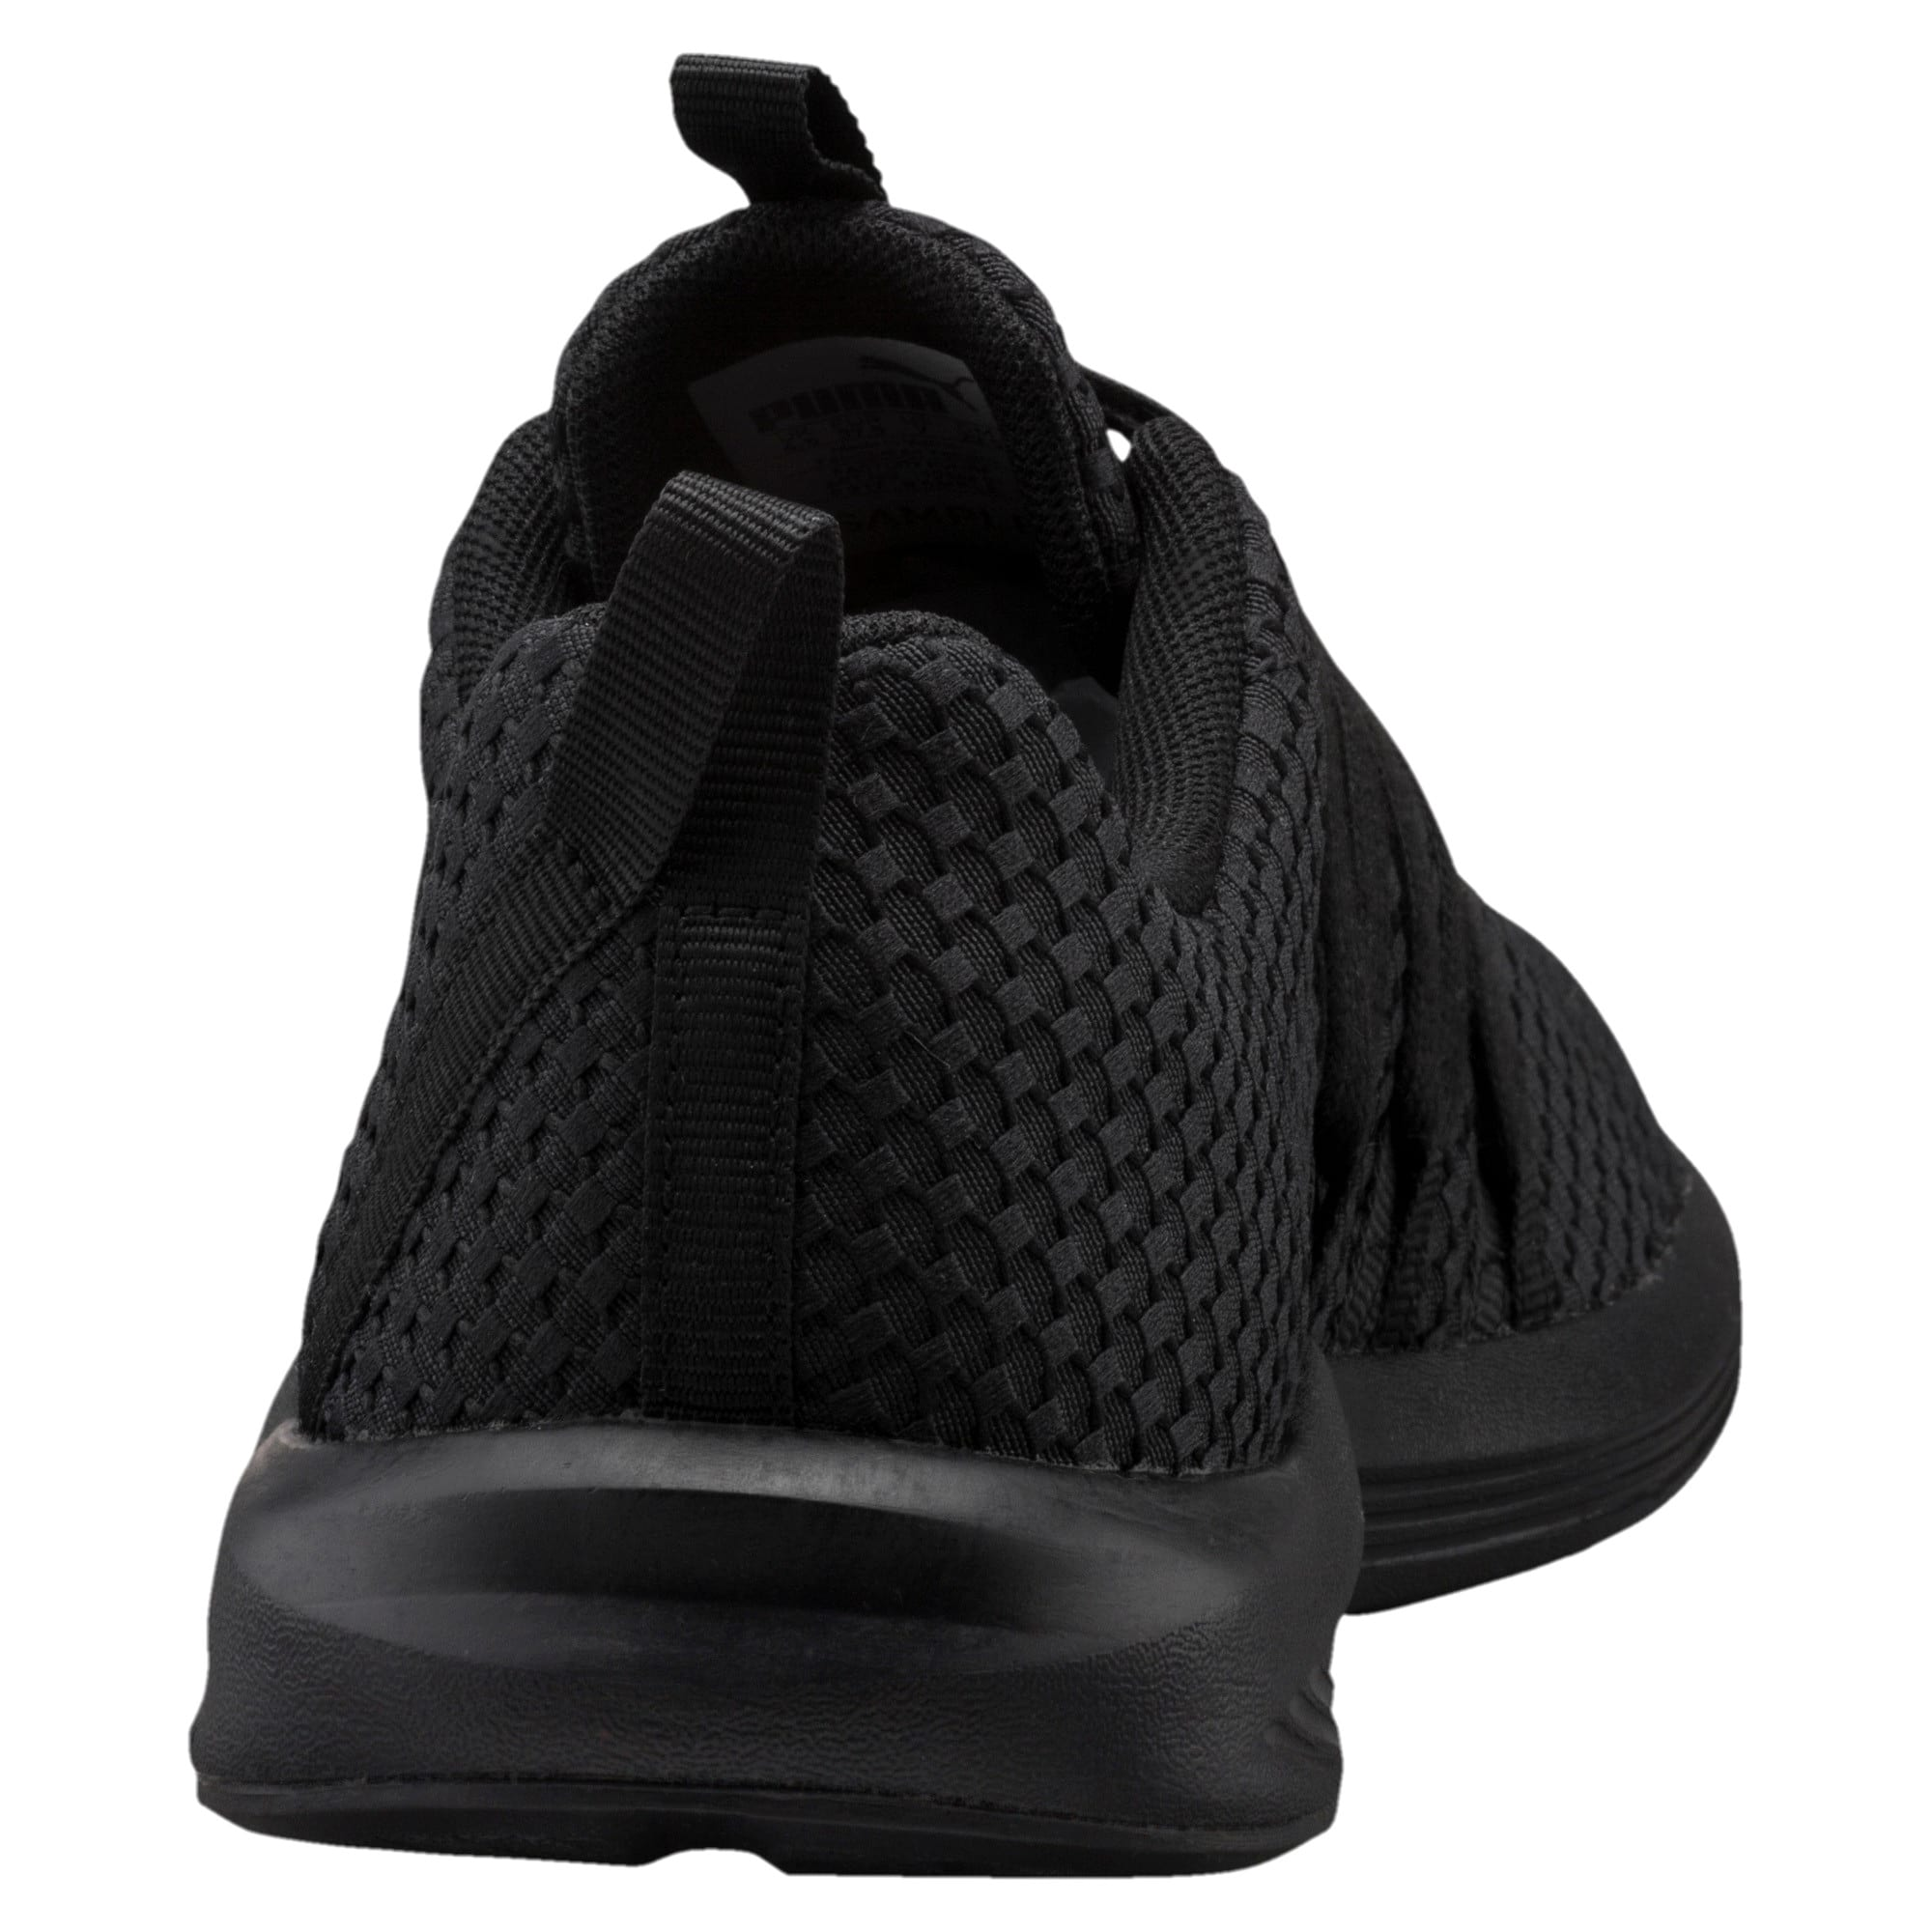 Thumbnail 4 of Prowl Alt Weave Women's Training Shoes, Puma Black-Puma Black, medium-IND